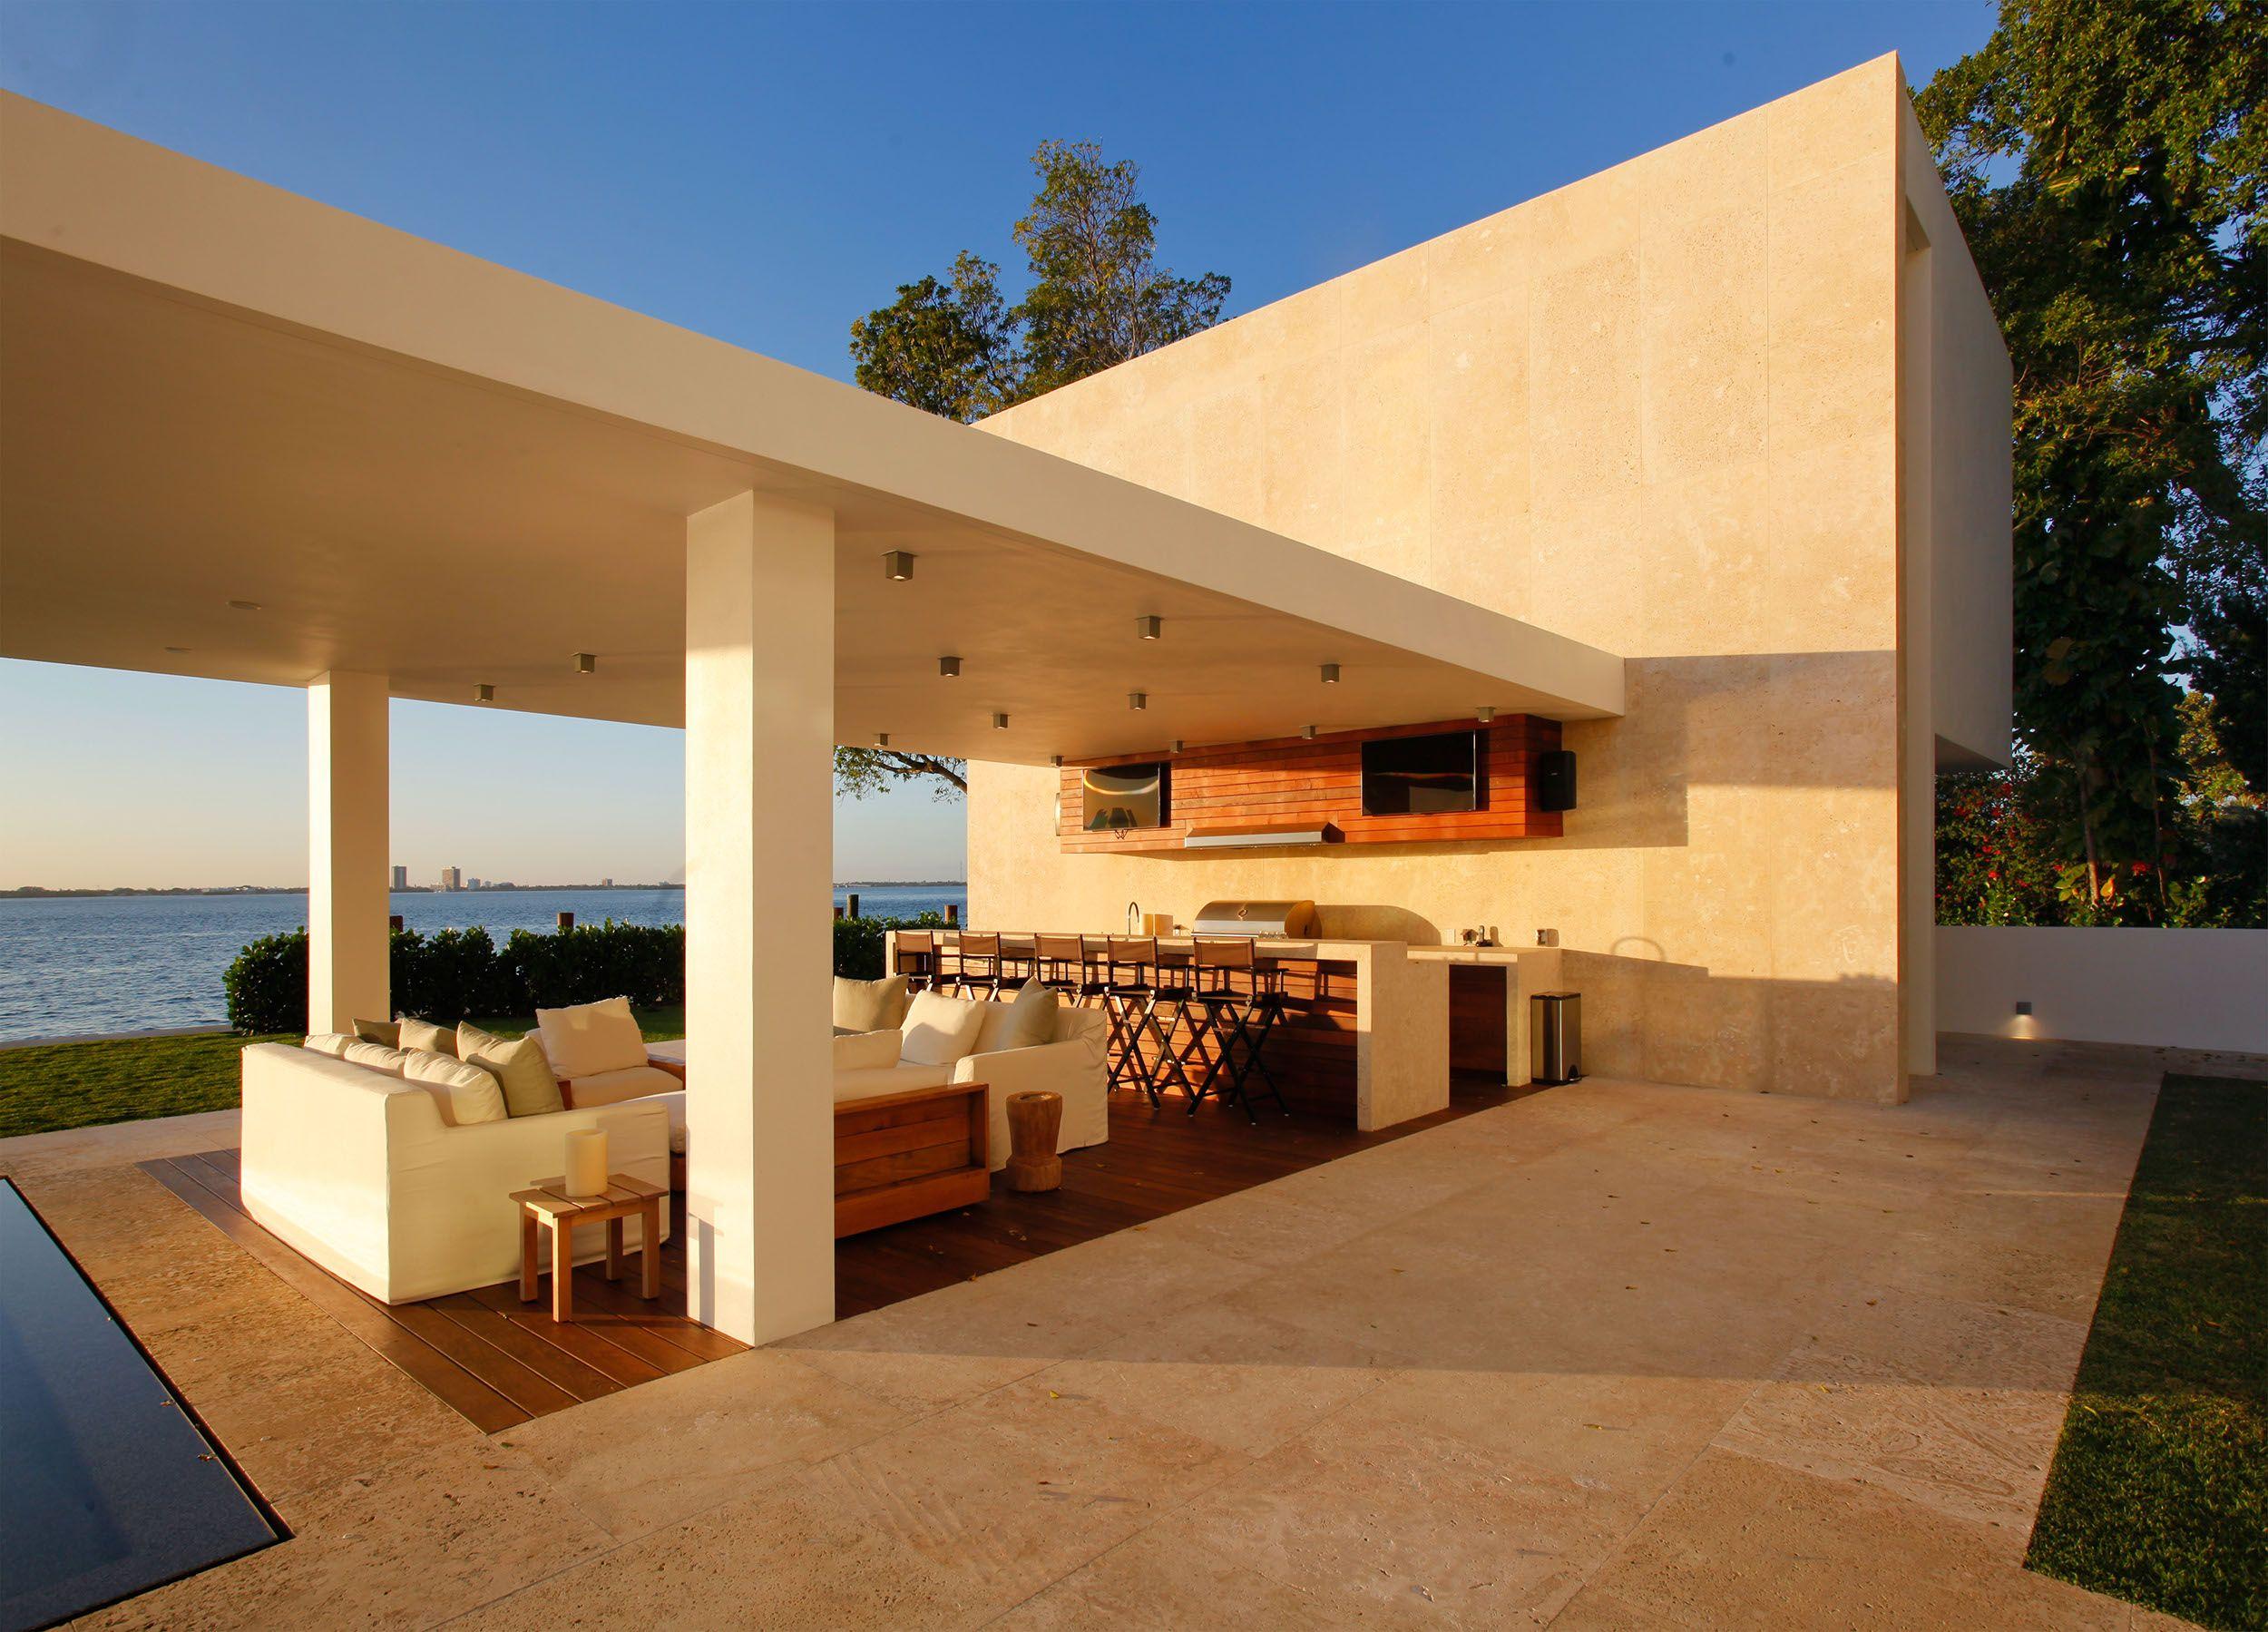 North Miami Beach Residence Opustone Natural Stone Interior Design Pool Patio Pergola Beautiful Patios Patio